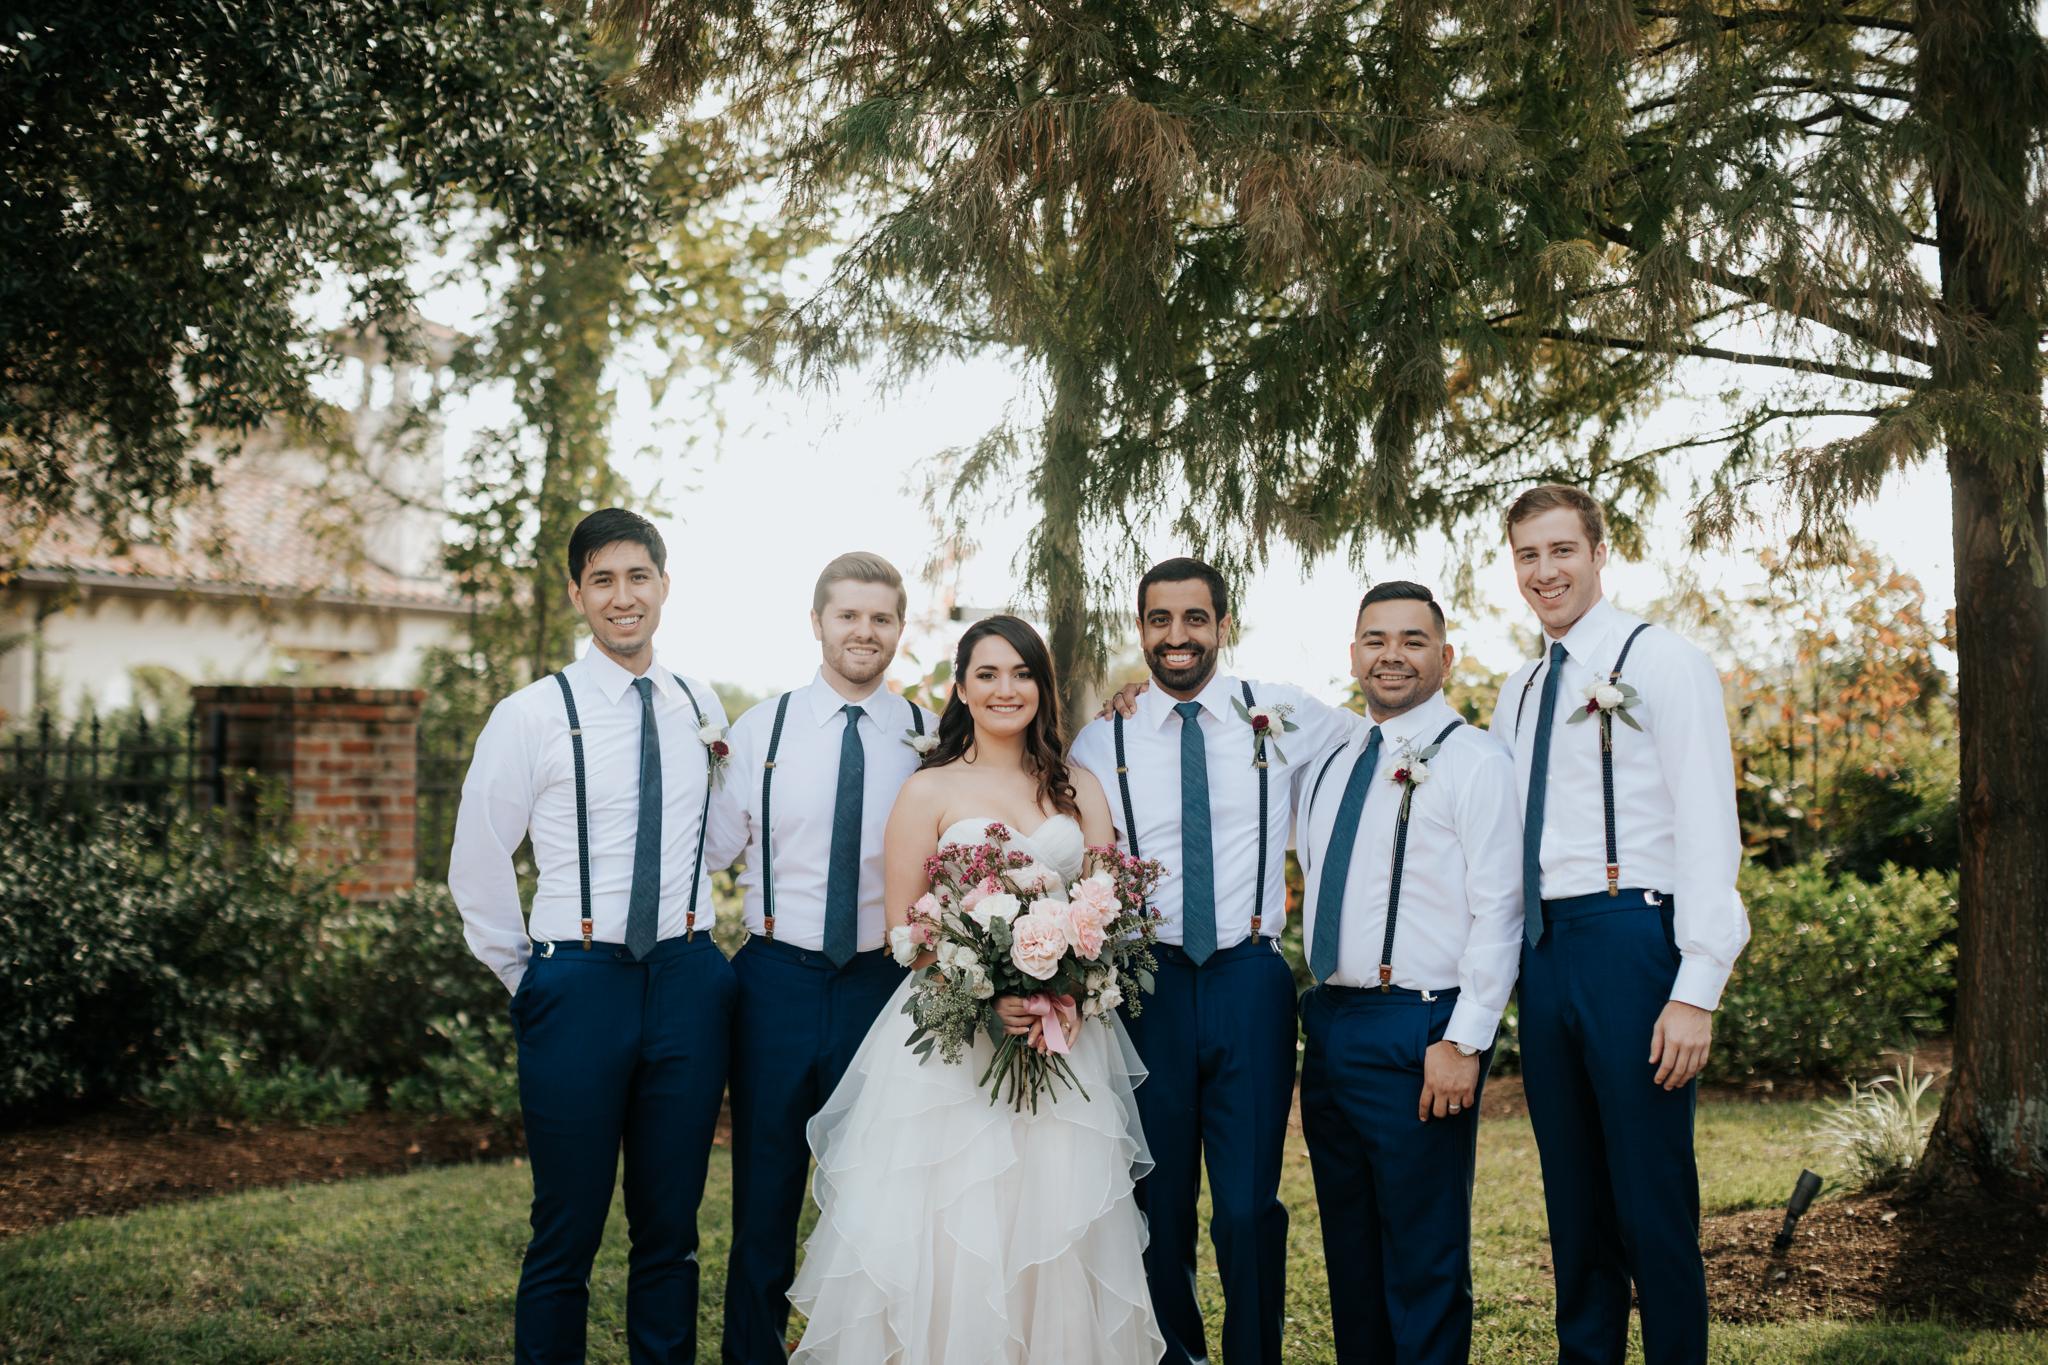 Leah Nicole Photography - Houston Wedding Photographer-Lake Conroe Wedding- Houston Wedding Photographer-16.jpg